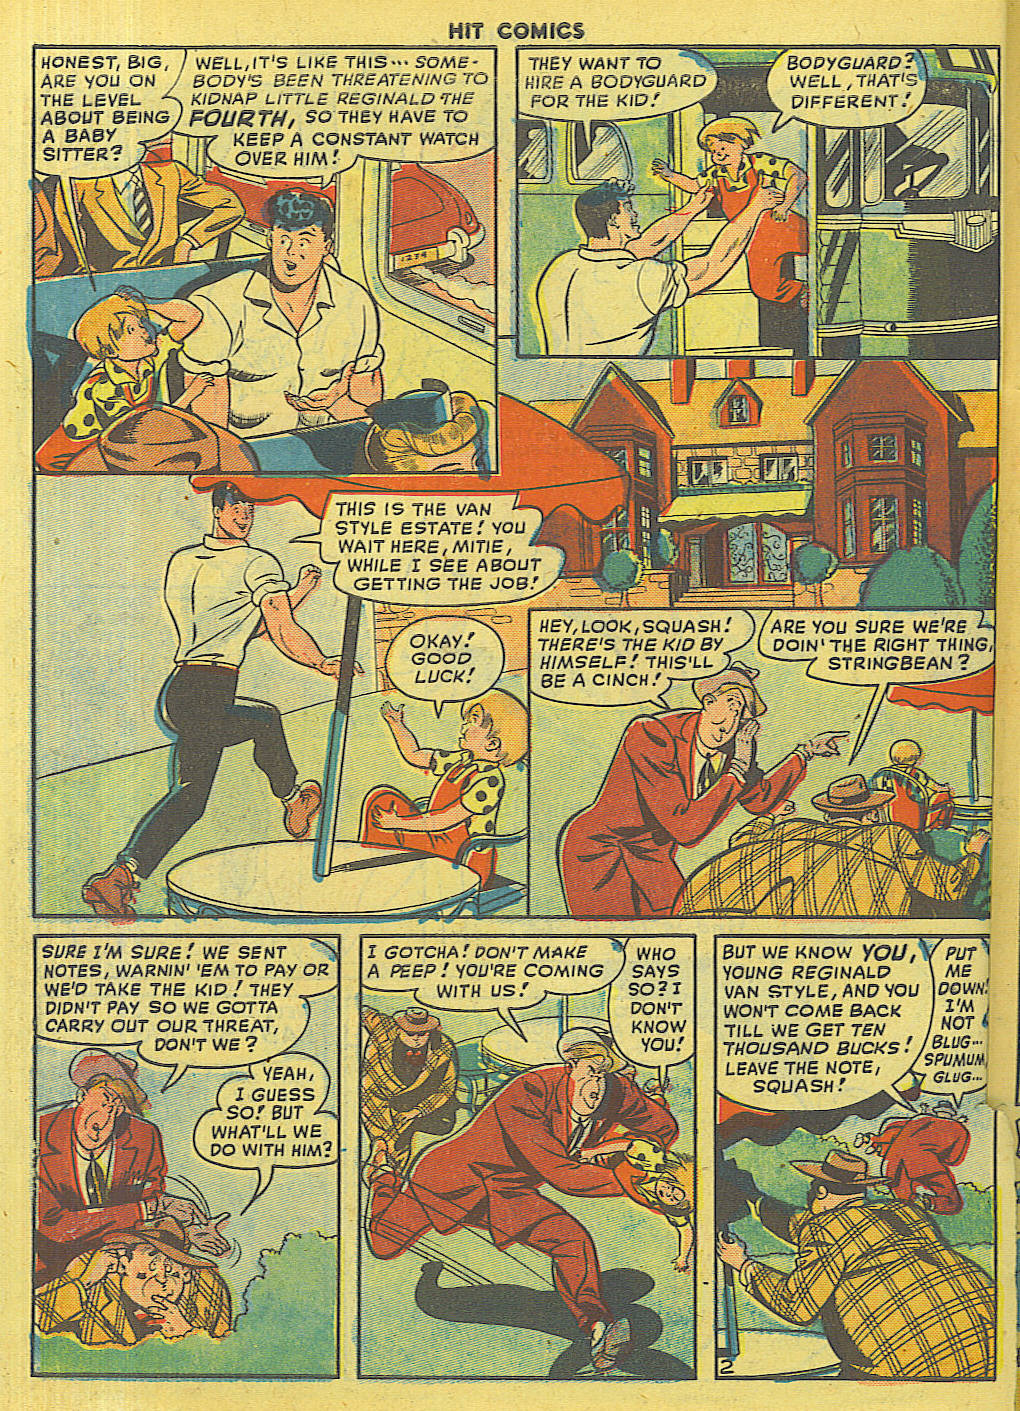 Read online Hit Comics comic -  Issue #56 - 44